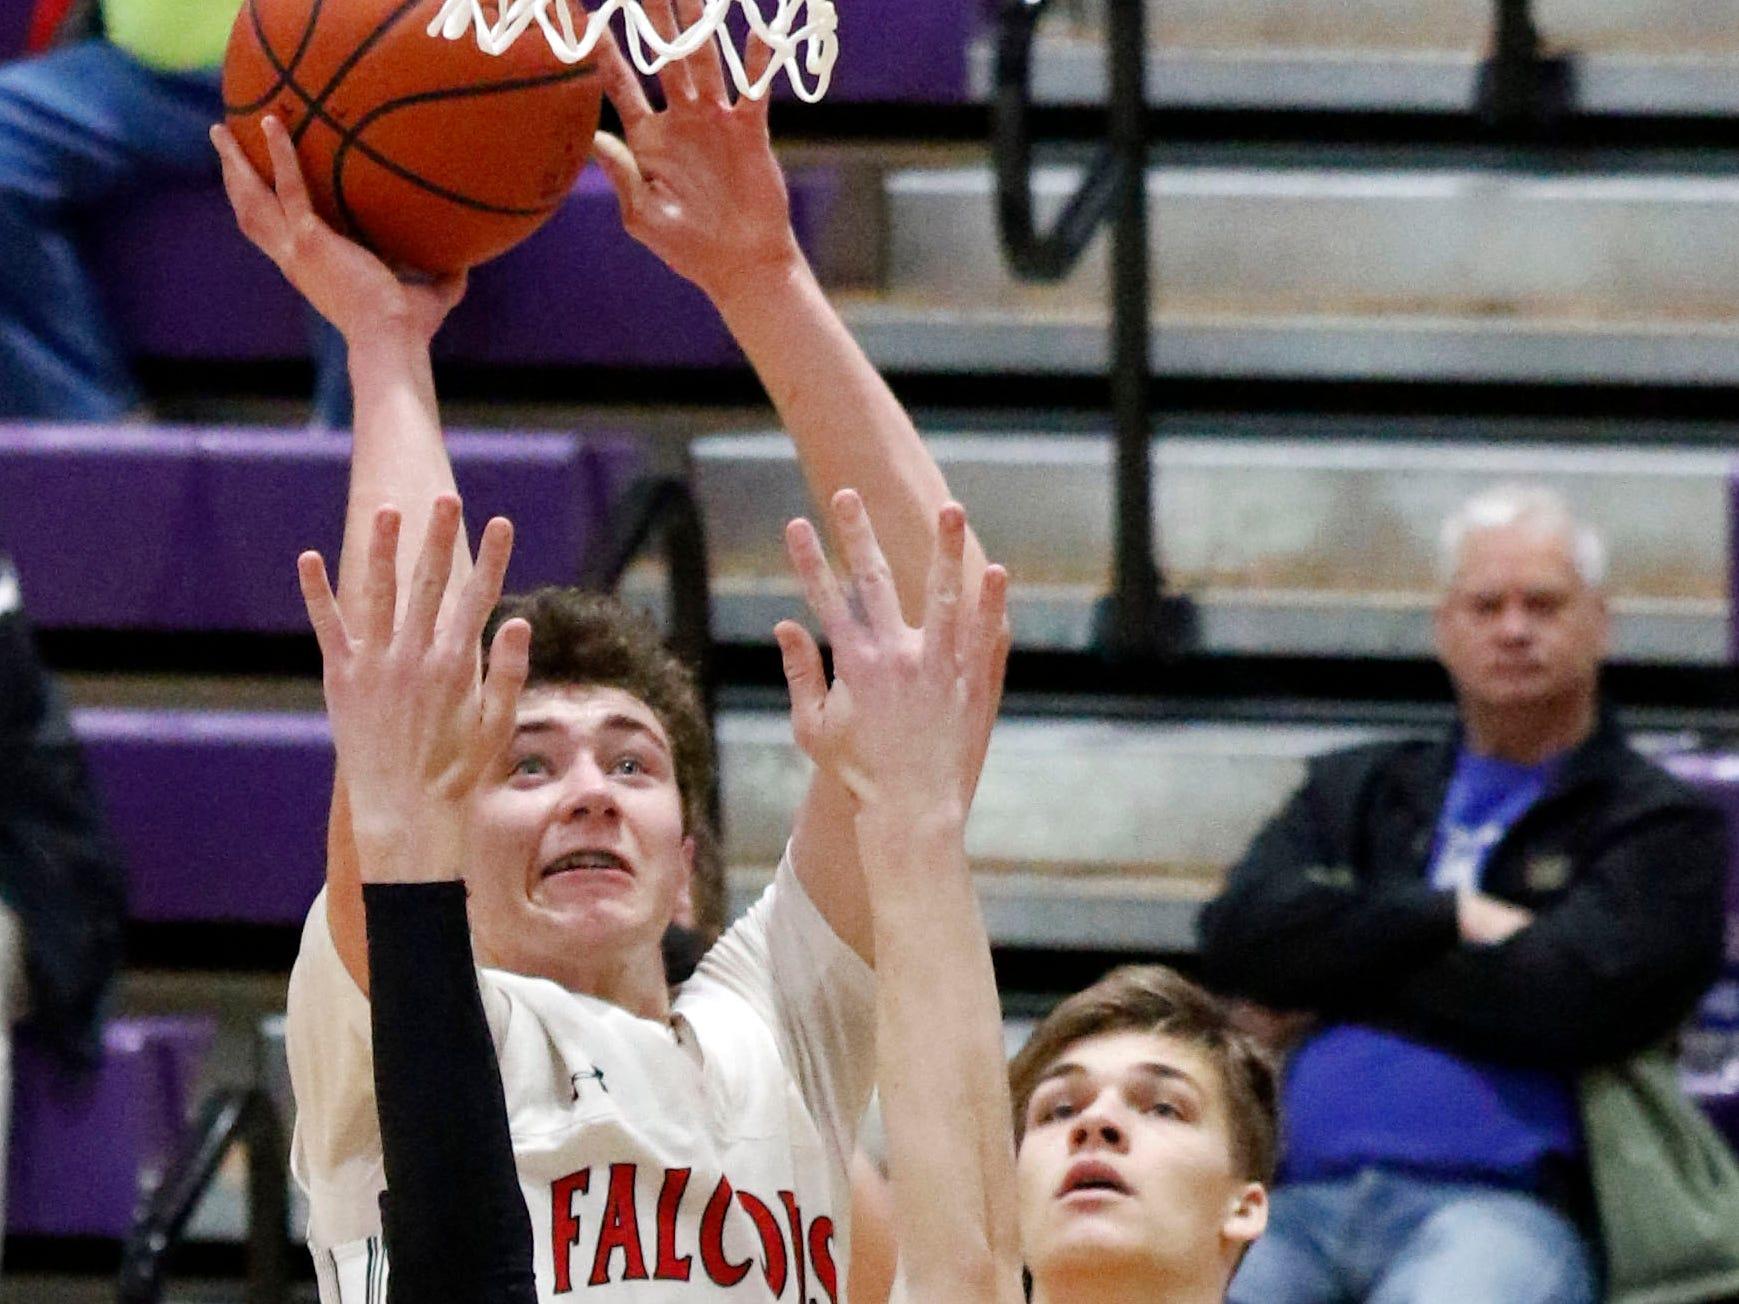 Fairfield Union's Huston Harrah takes a shot during Saturday's game, Feb. 23, 2019, at Logan High School in Logan. The Falcons defeated Marietta 48-33.